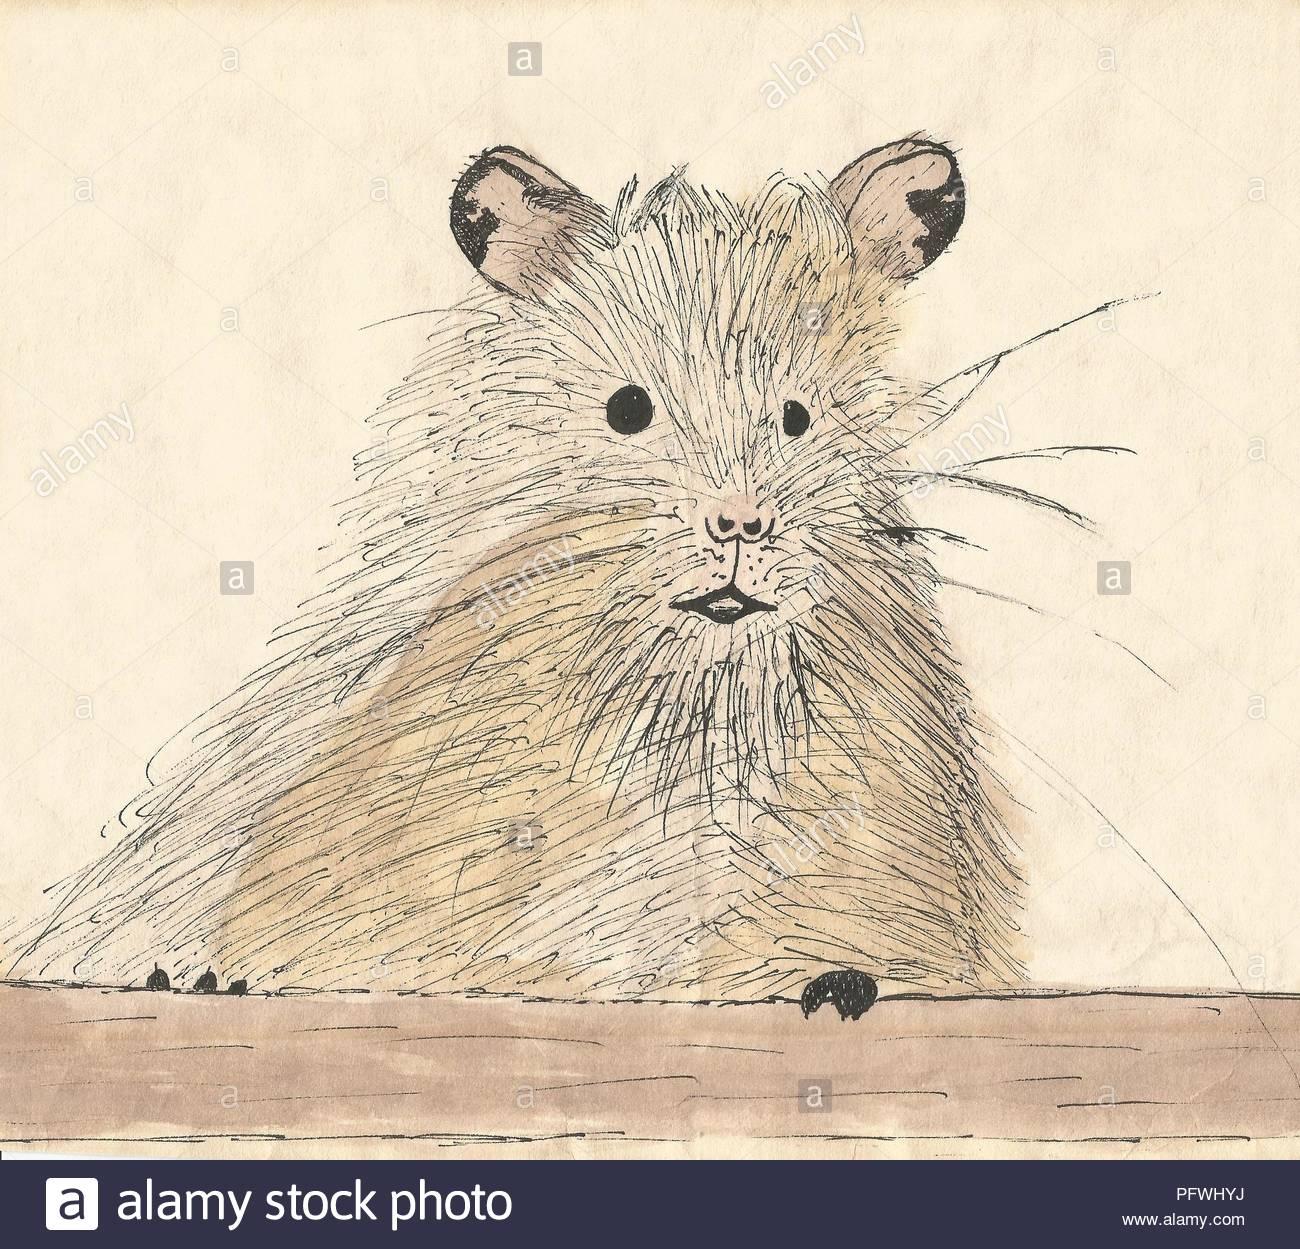 Animal Drawing Imágenes De Stock & Animal Drawing Fotos De Stock - Alamy